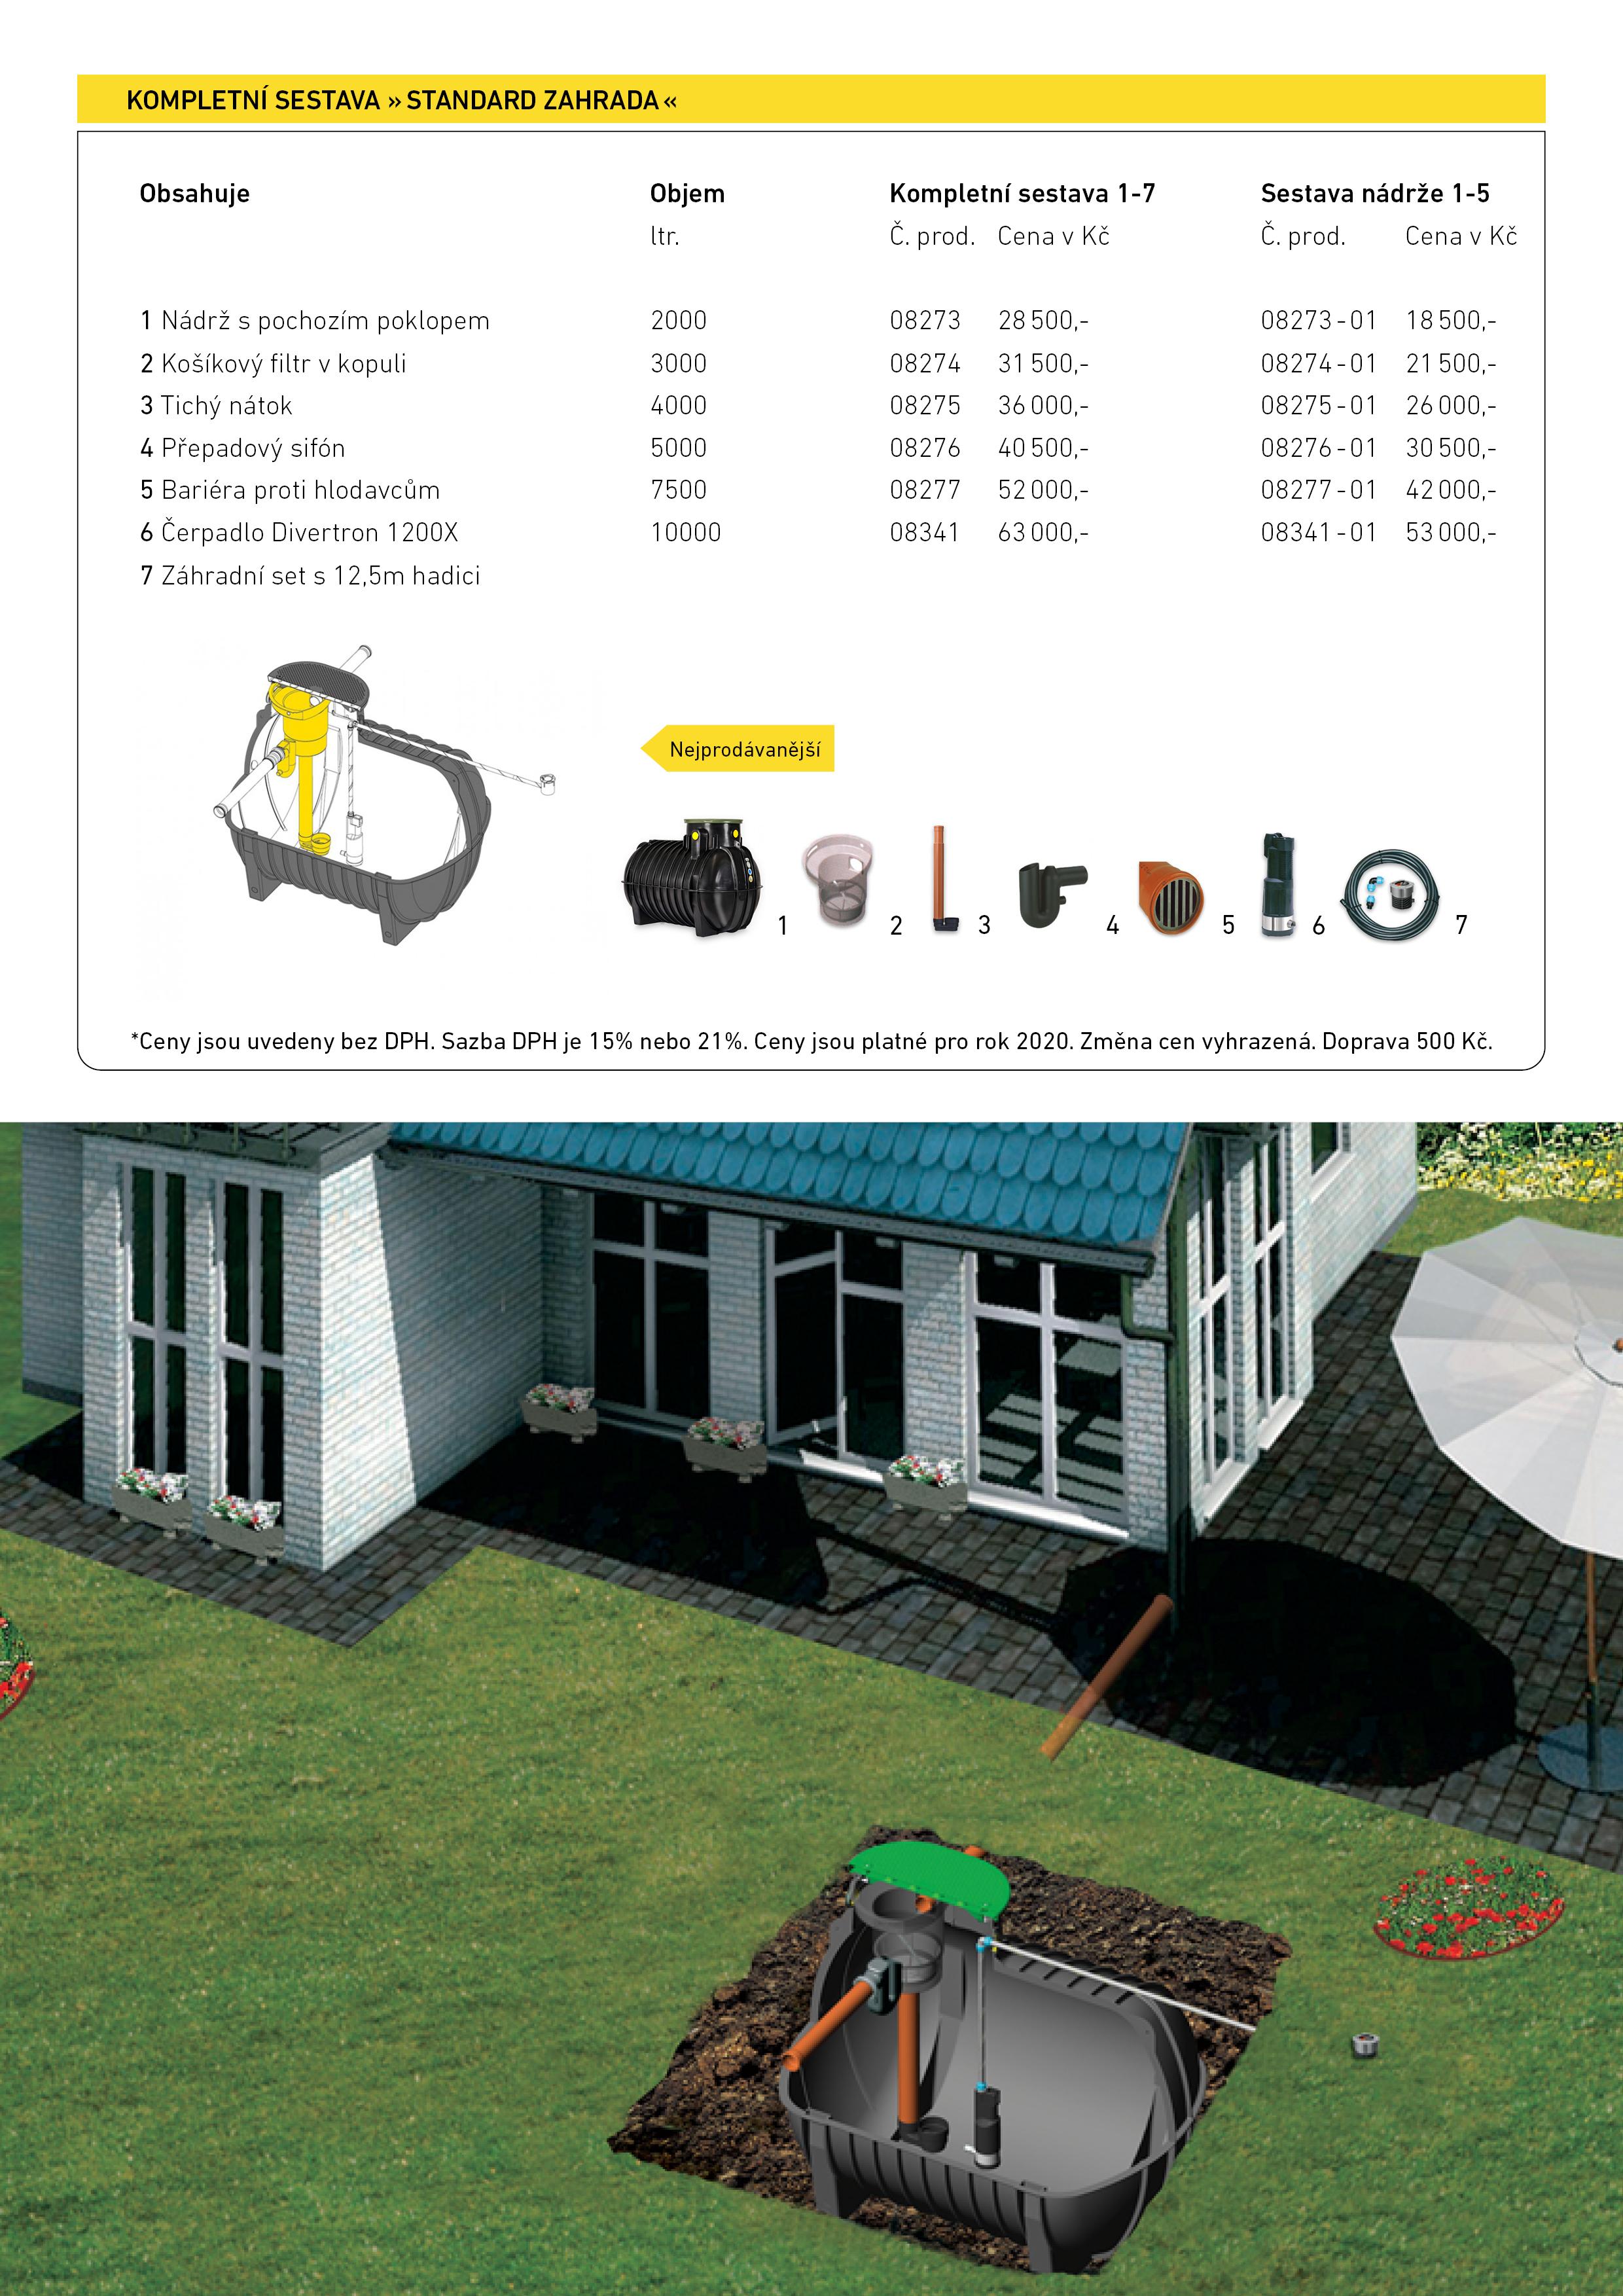 Nádrže na dešťovou vodu - sestava Standard zahrada